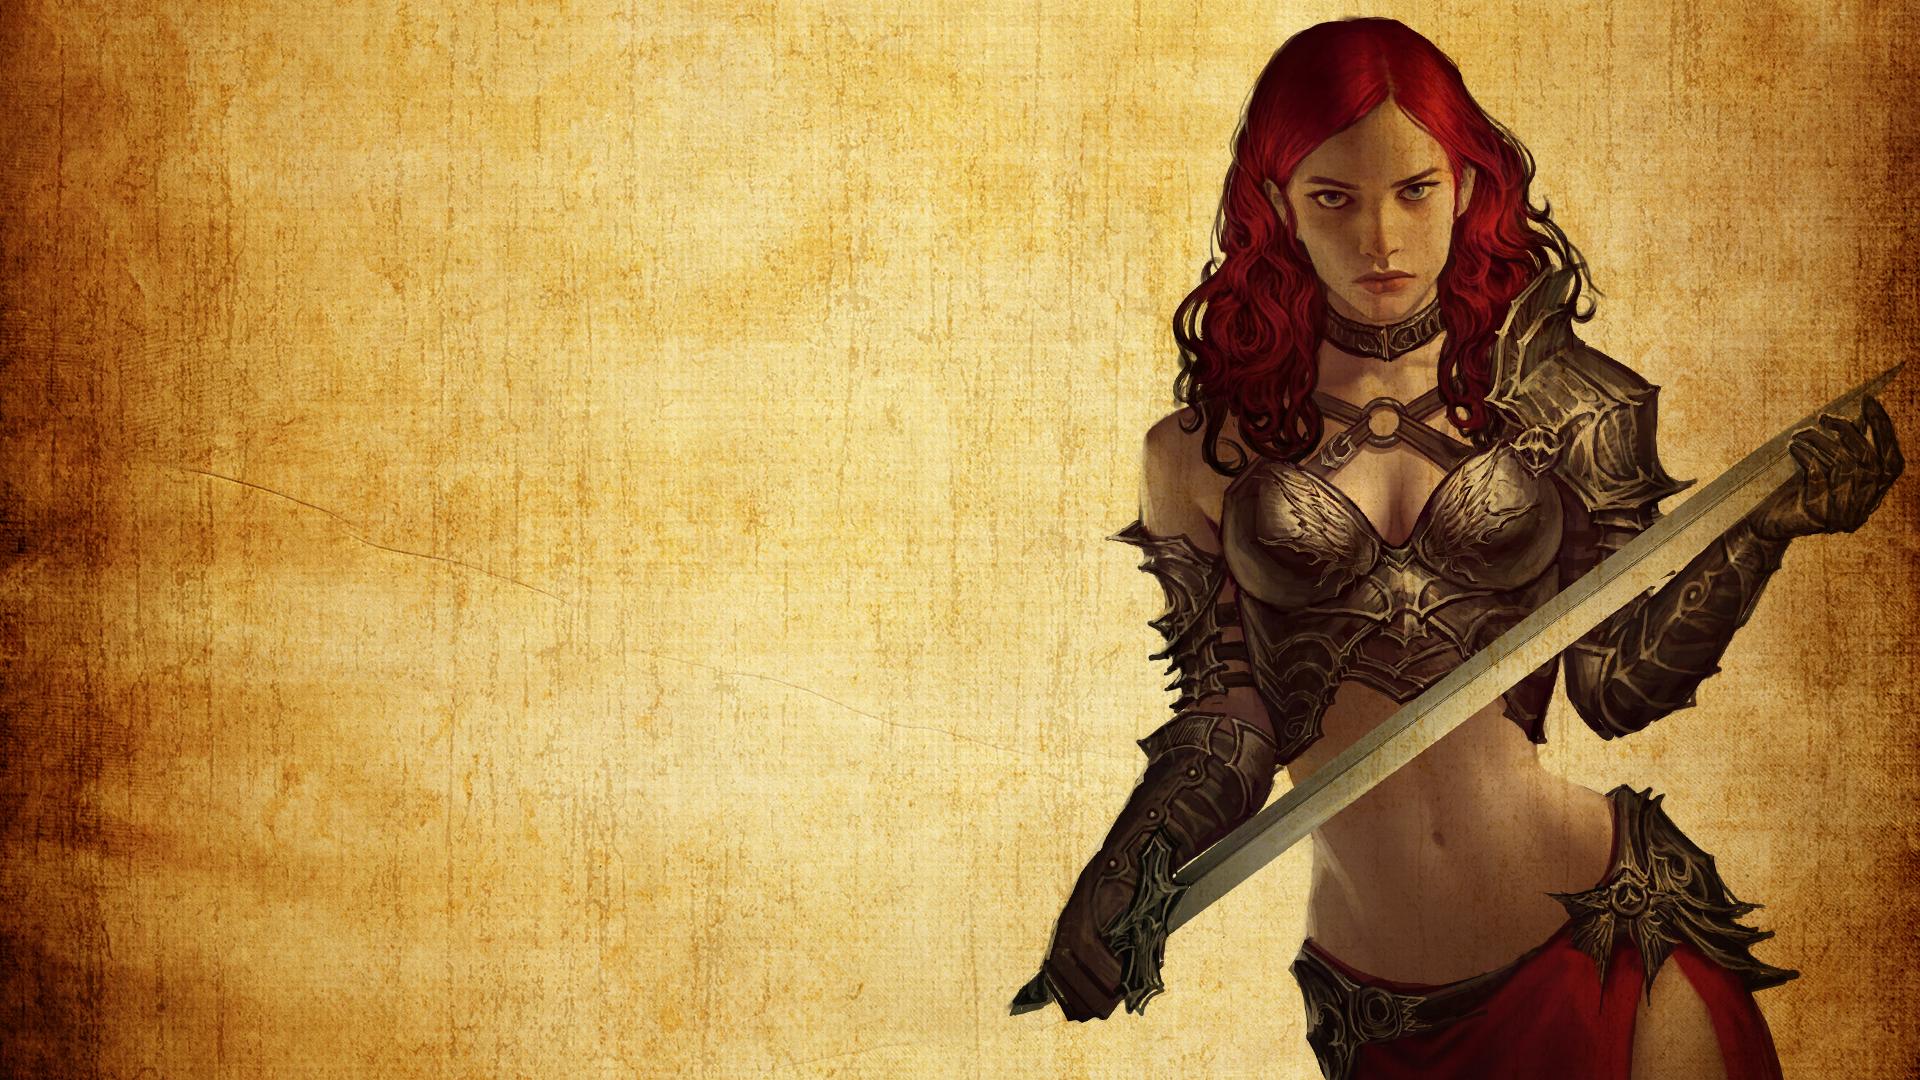 Fantasy Women Digital Art